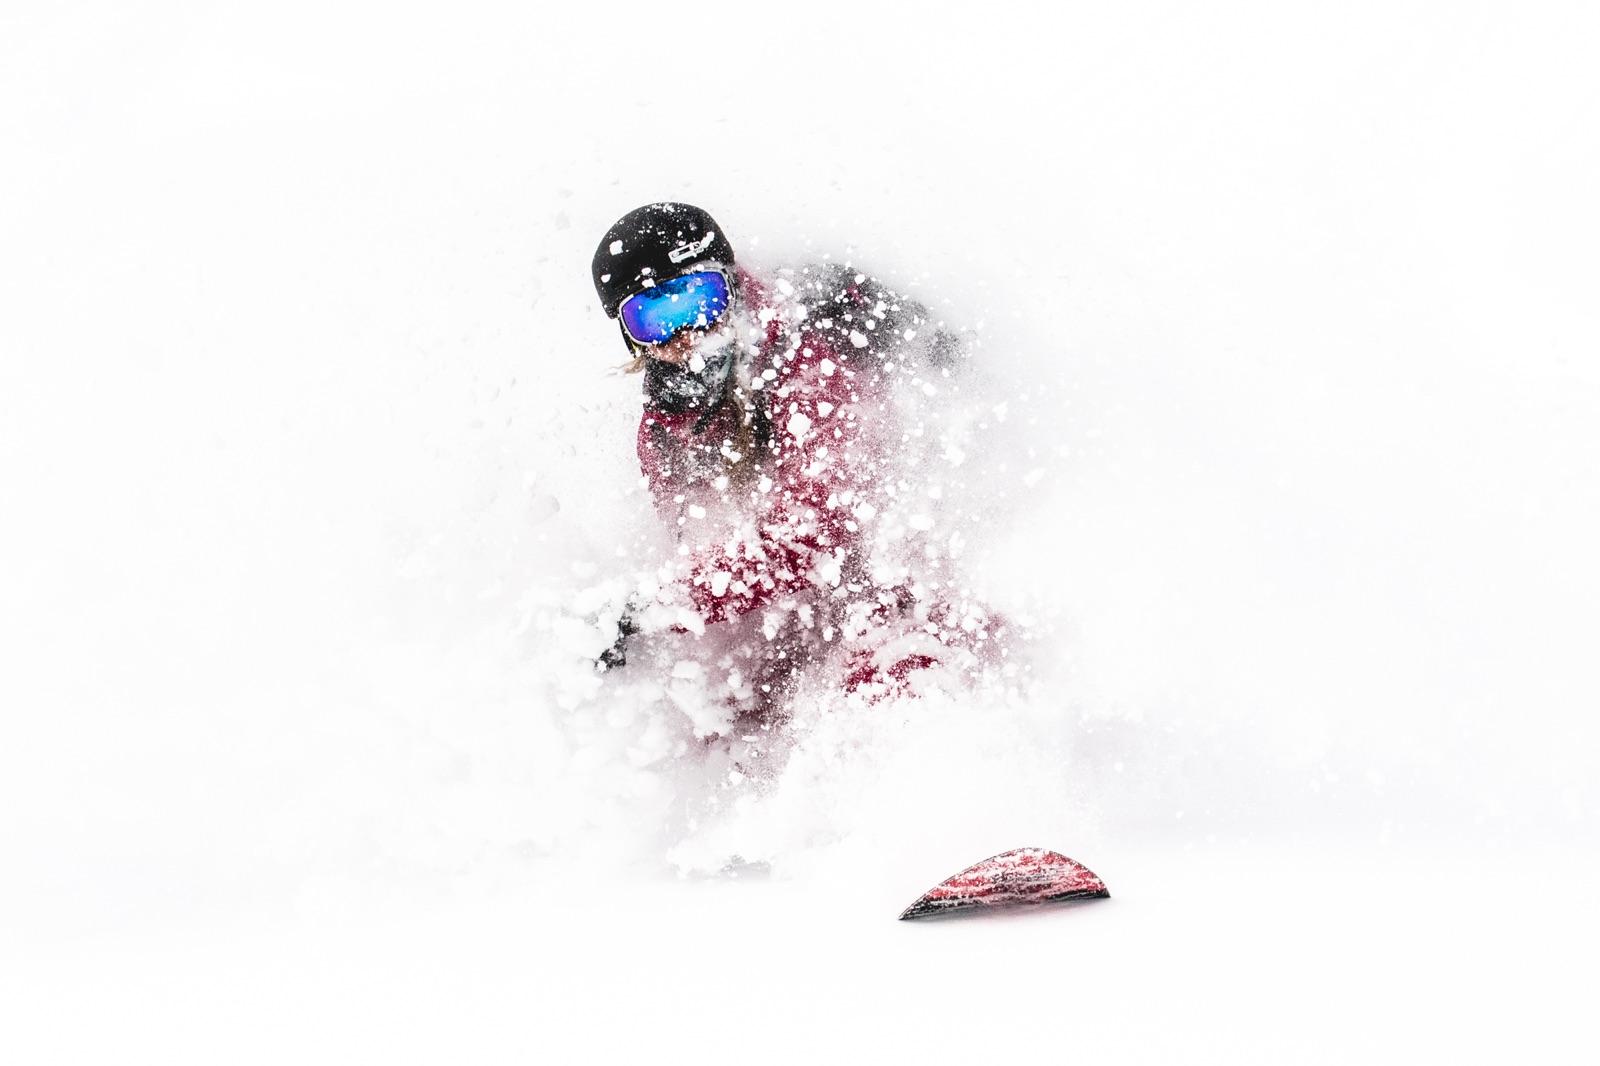 Kelly Halpin Snowboarding